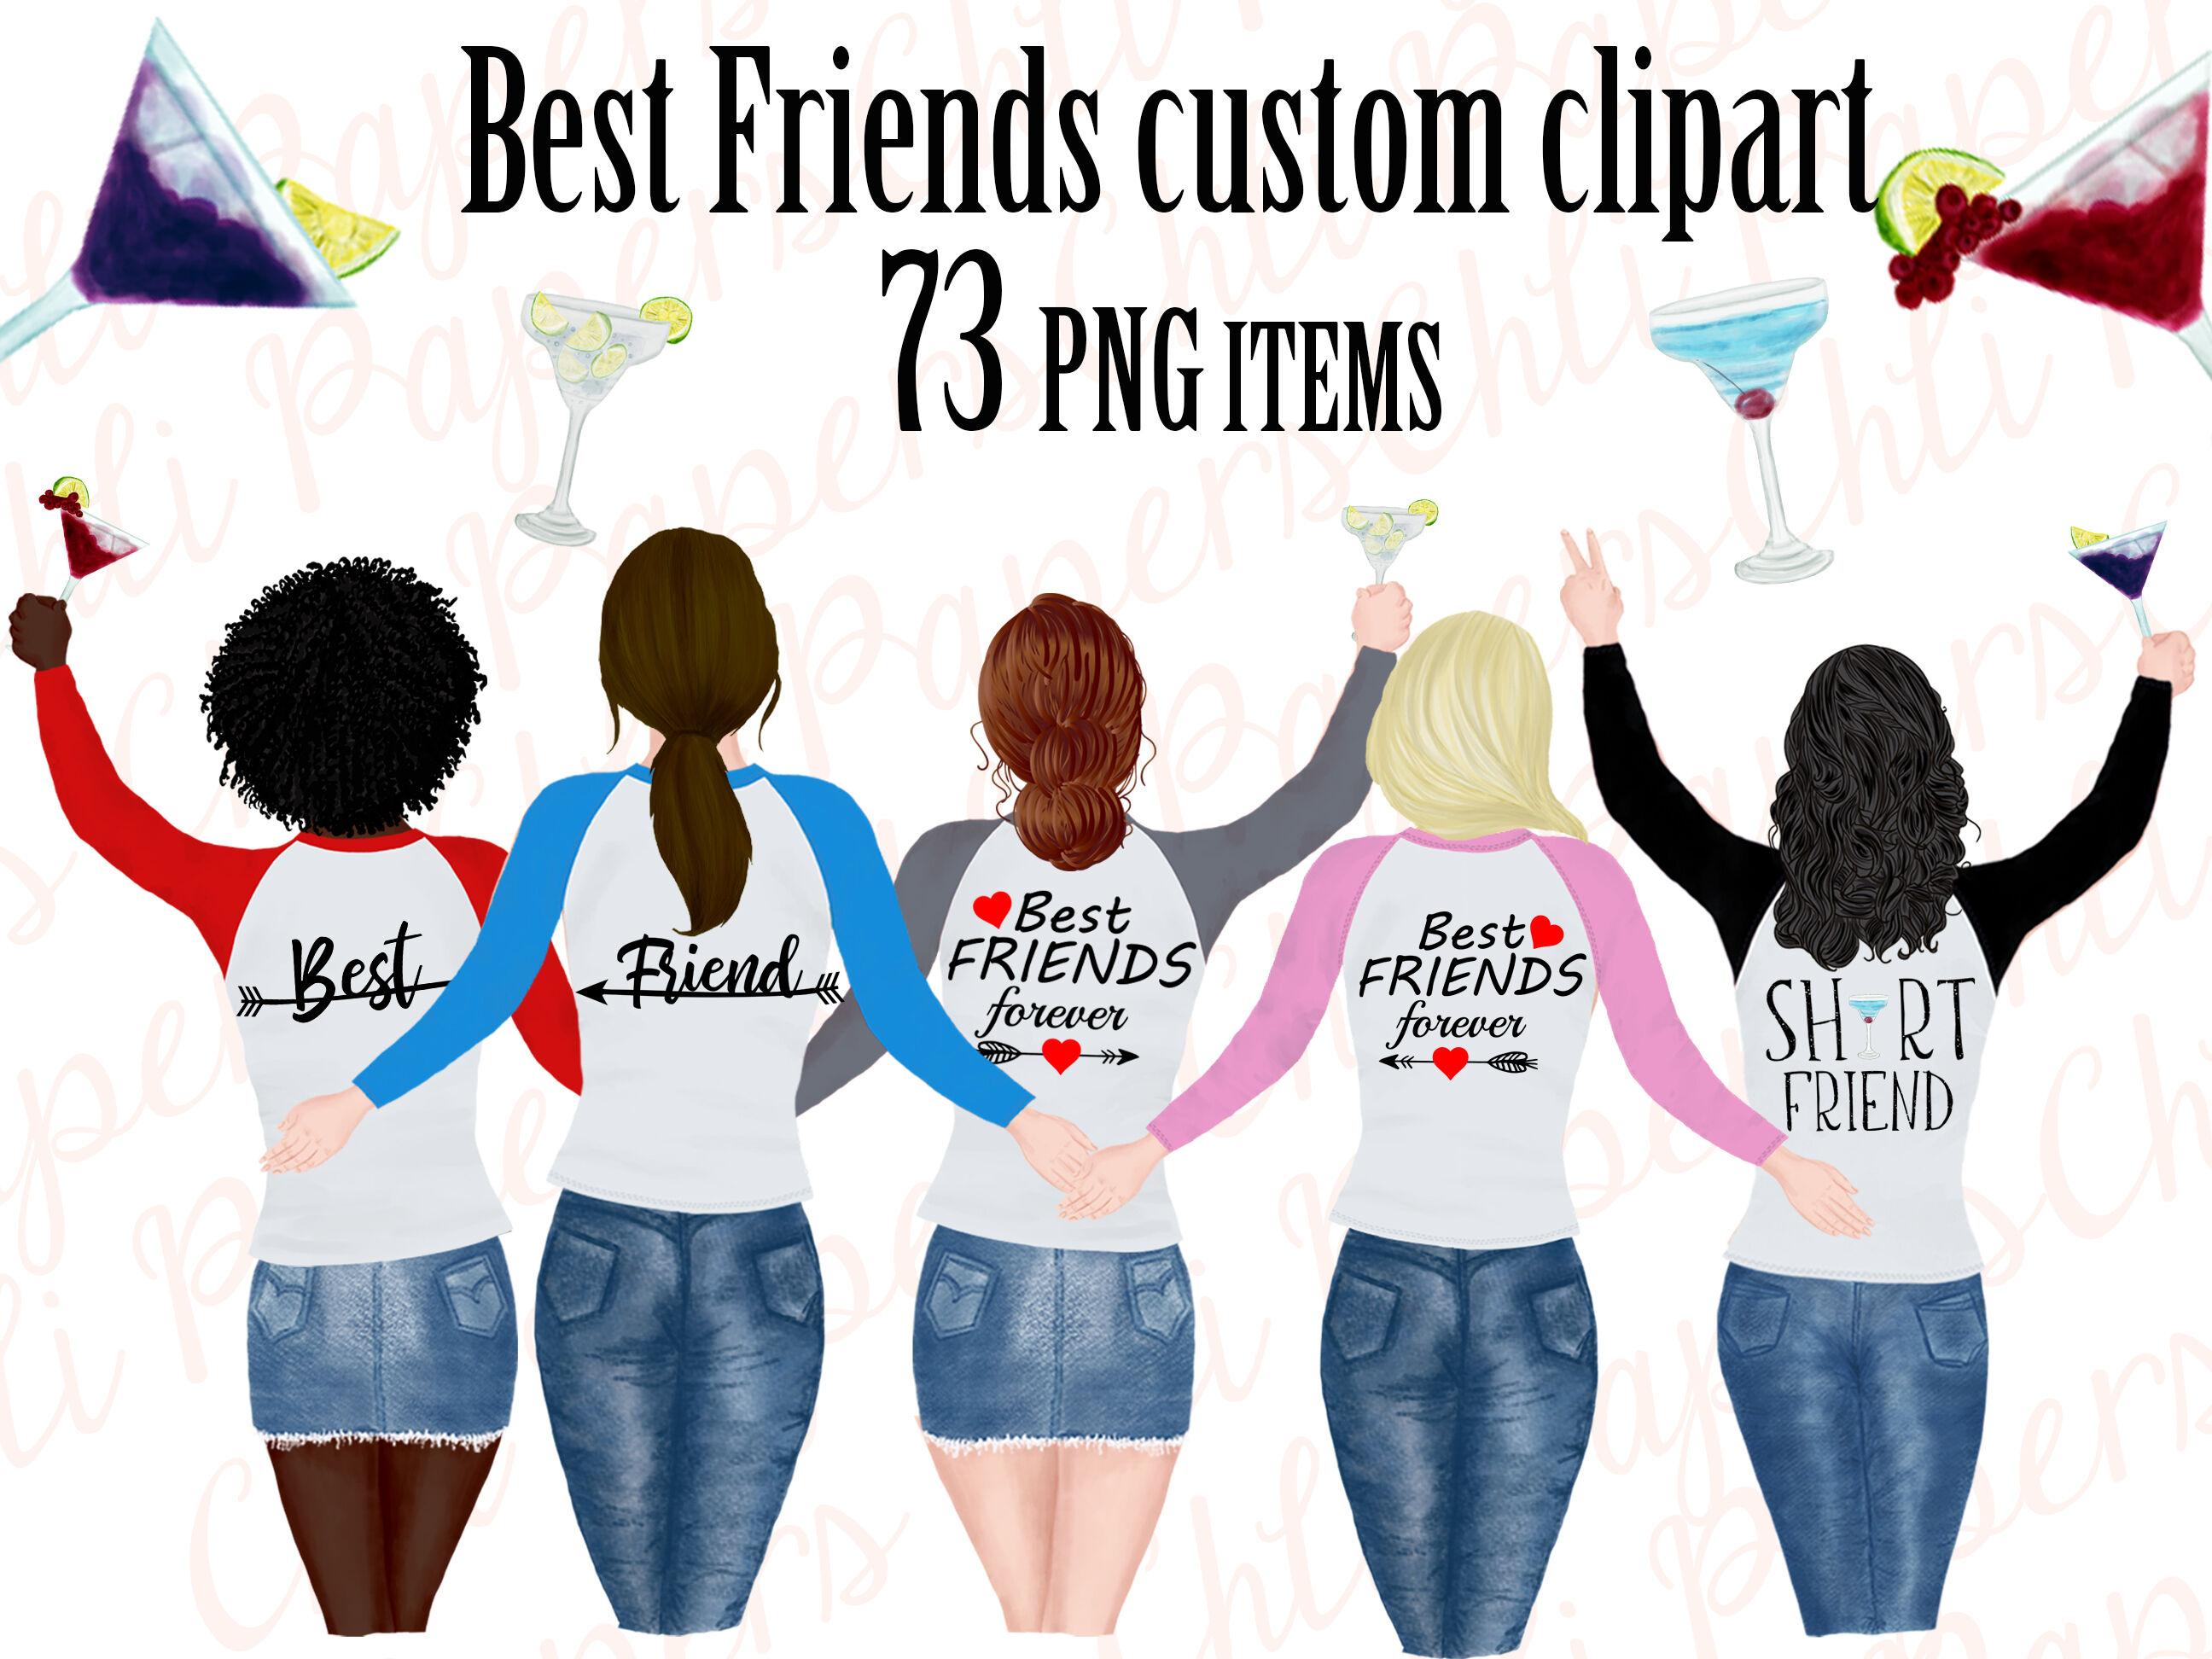 Best friend clipart,Portret creator,Bachelorette party girls.